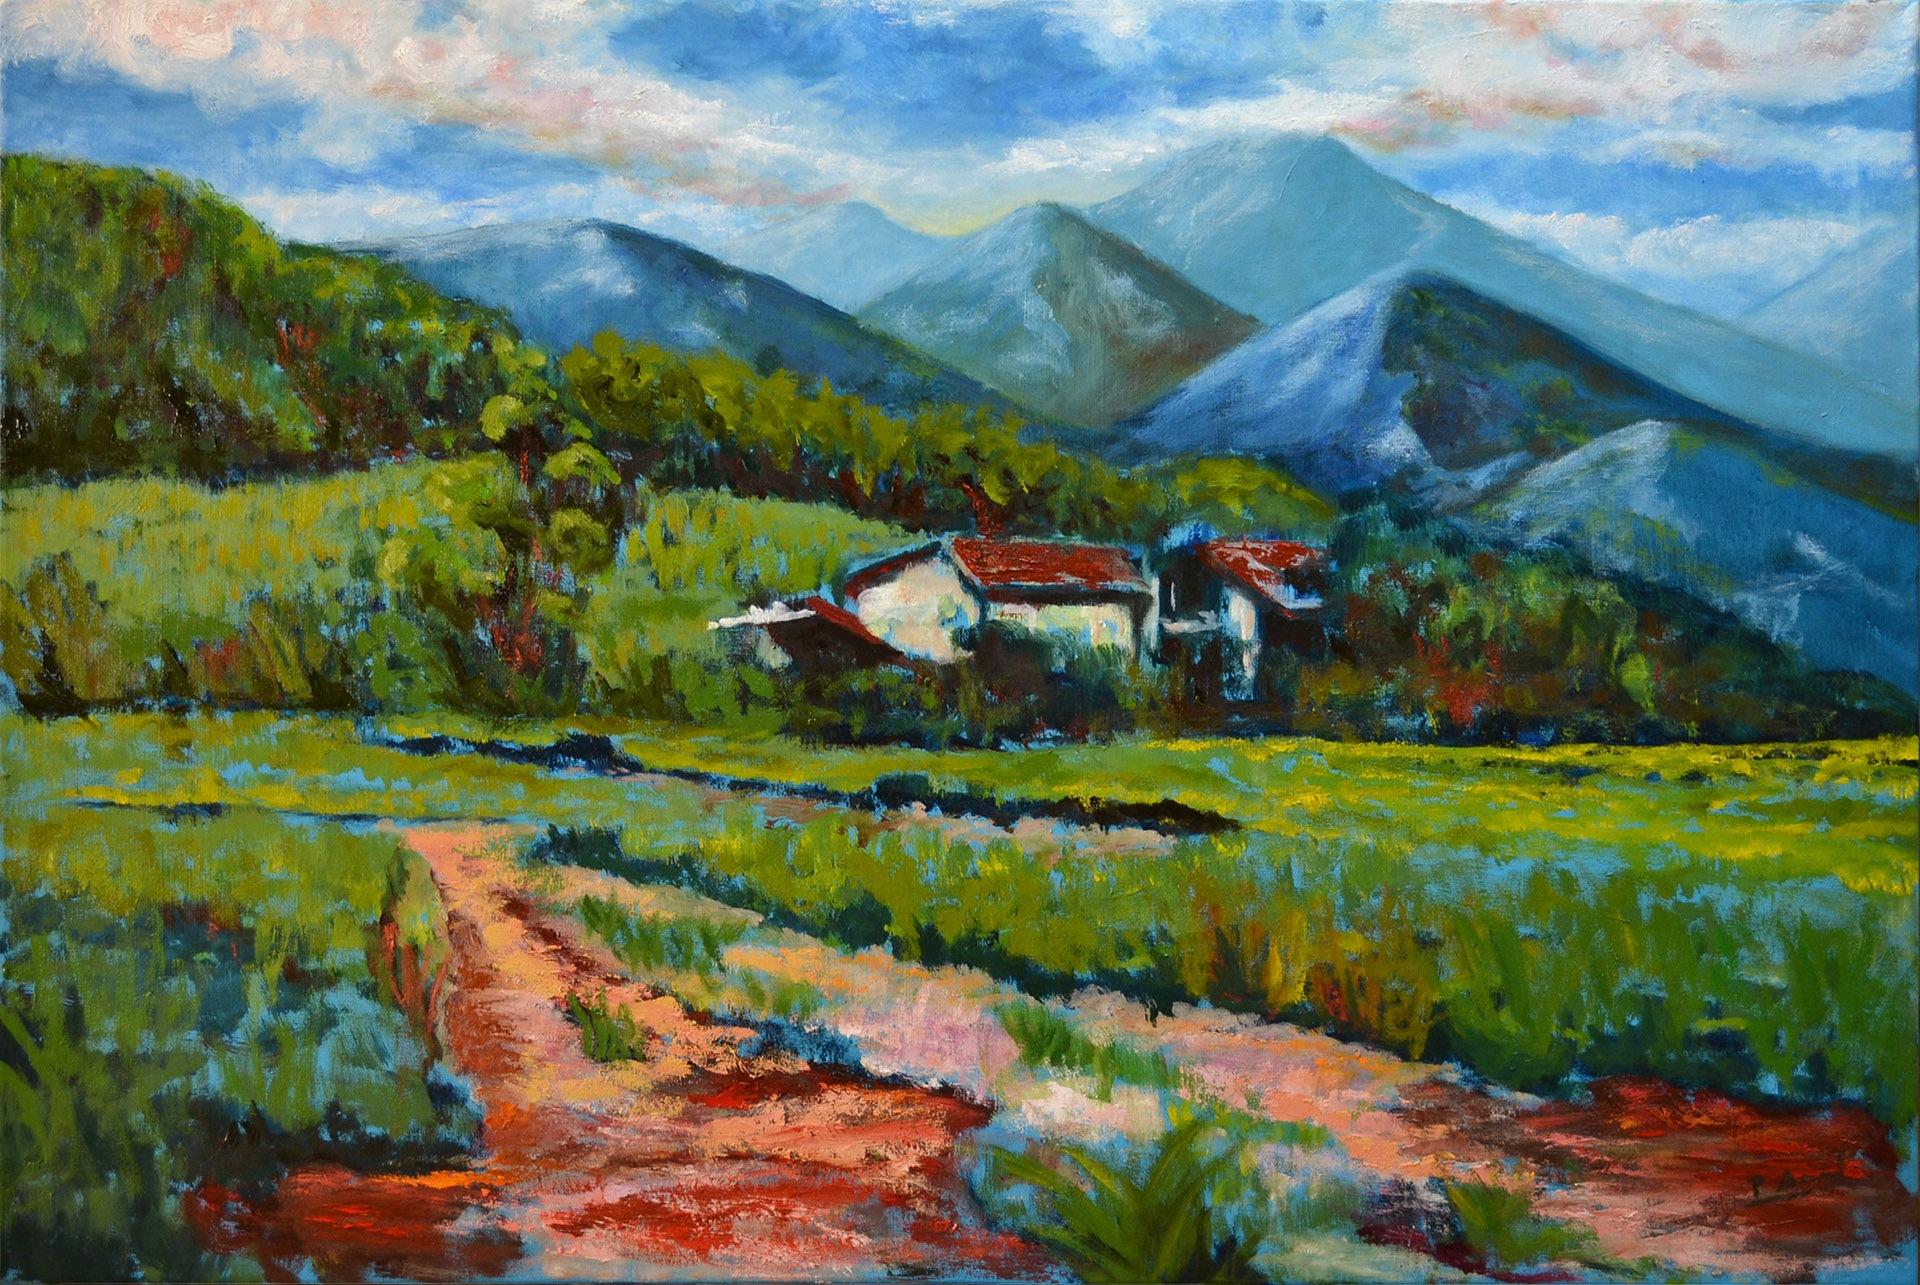 Paisaje sobre azul. Pilar Aceña, óleo sobre lienzo.  90 x 60cm. Año 2015